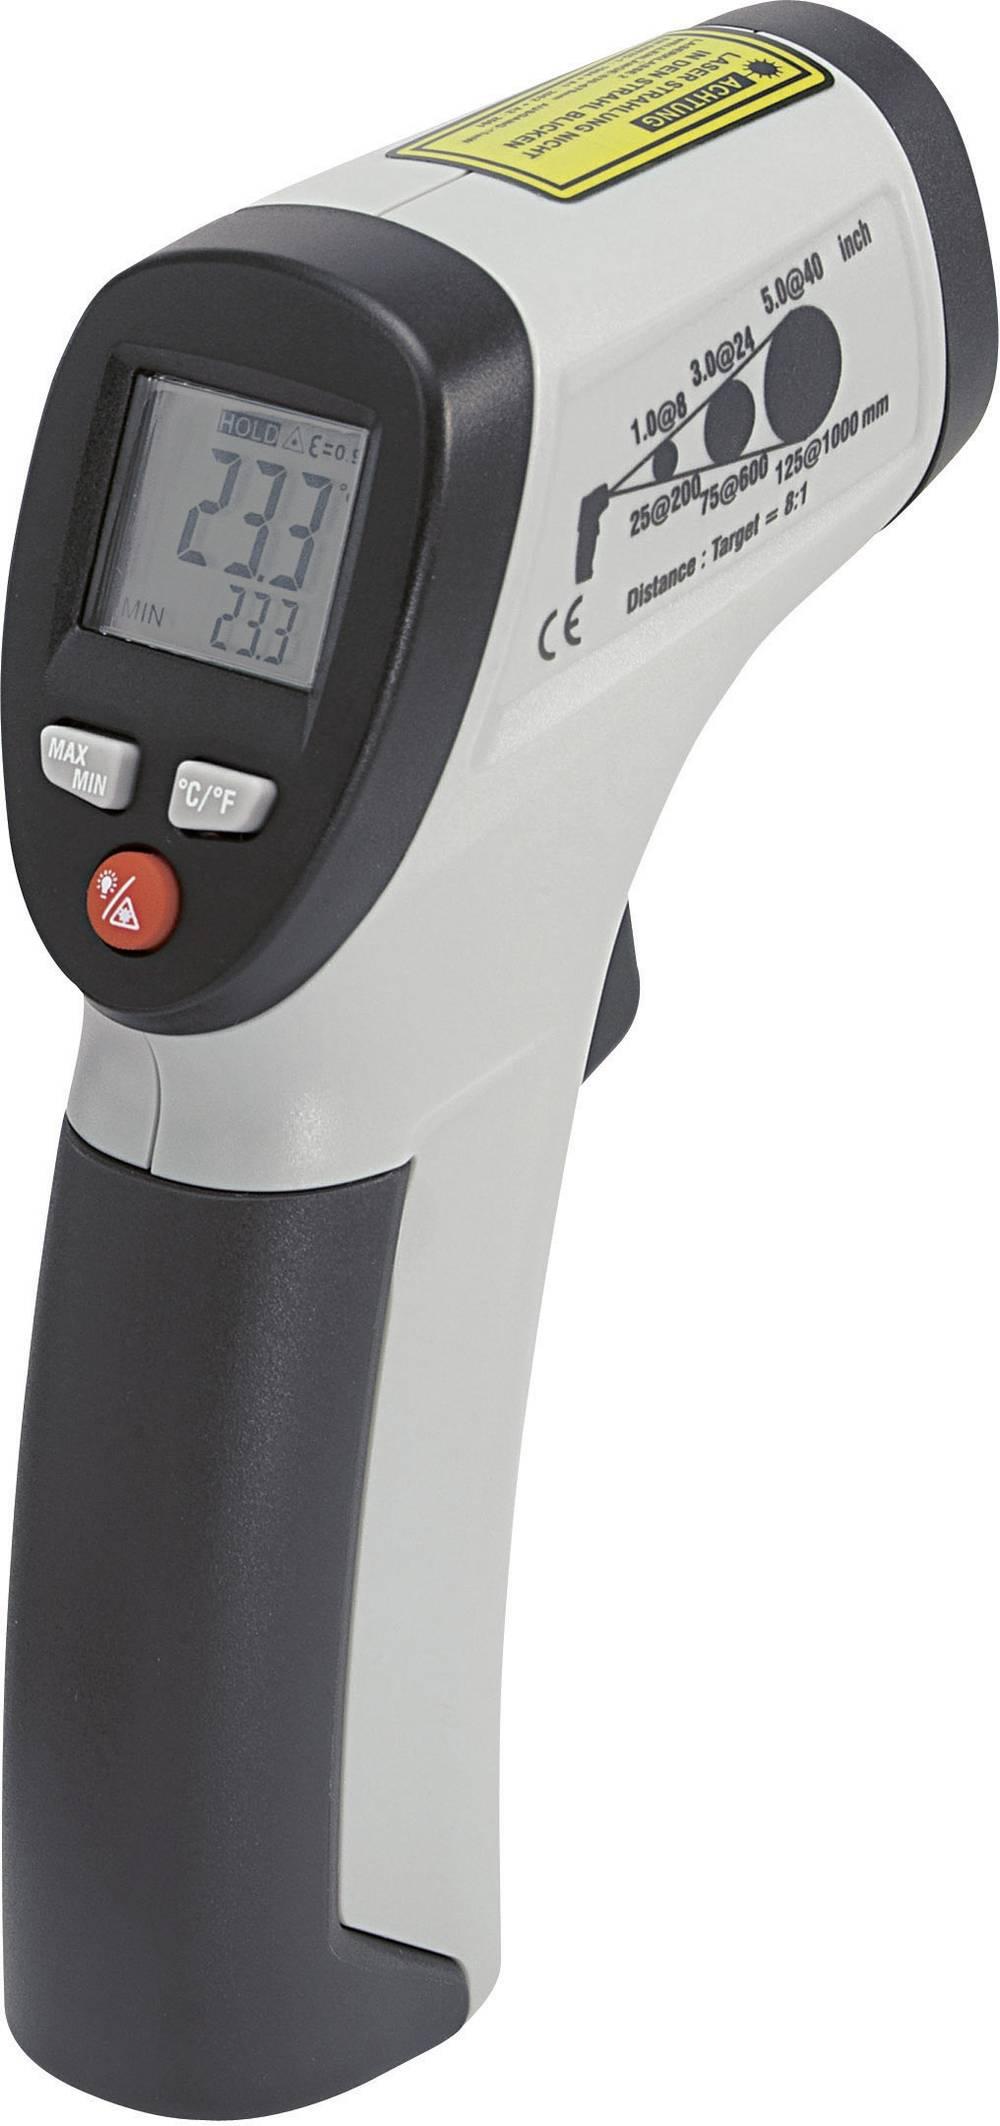 Infracrveni termometar VOLTCRAFT IR 260-8S optika 8:1 -30 do +260 °C pirometar kalibriran prema: tvorničkom standardu